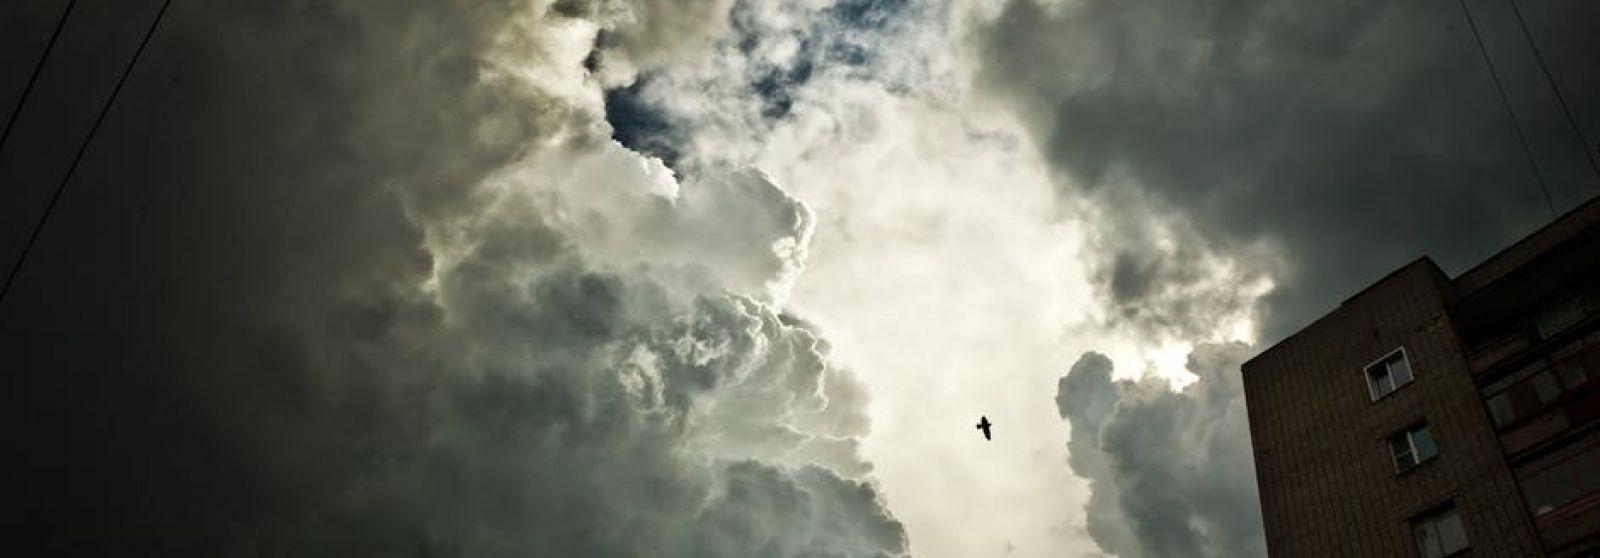 How to be Prepared for Hurricane Season